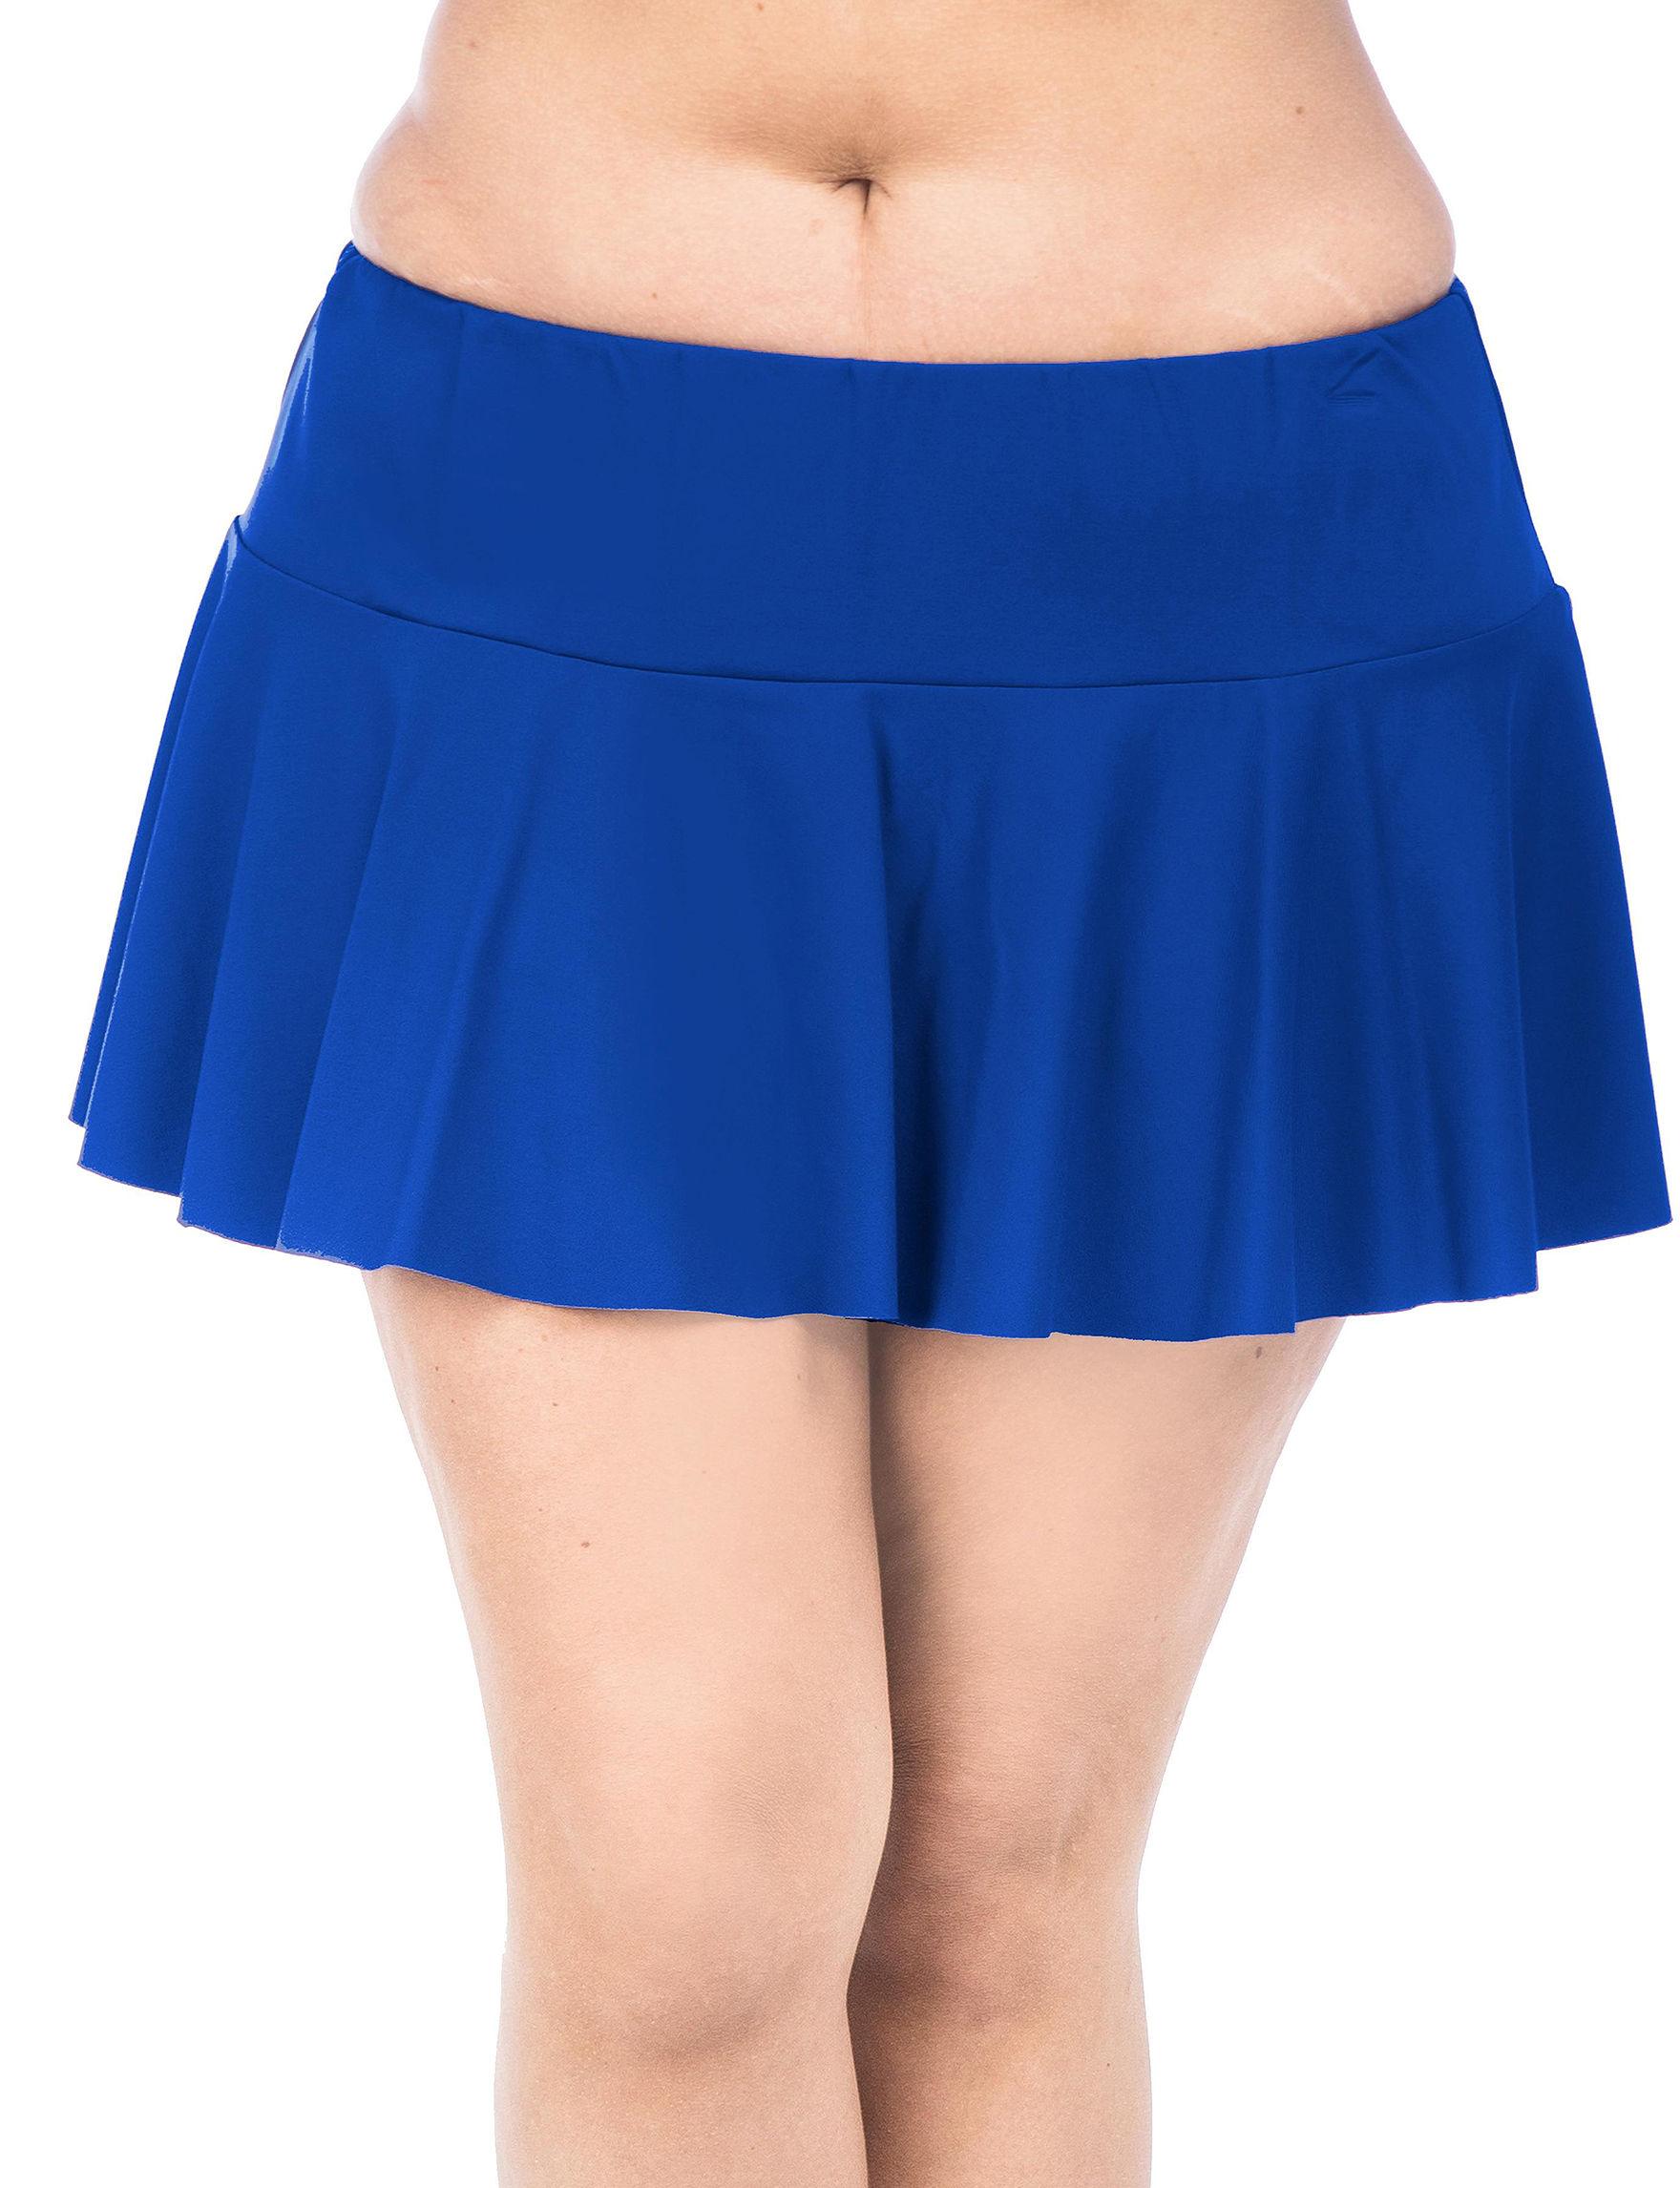 Chaps Royal Blue Swimsuit Bottoms Skirtini